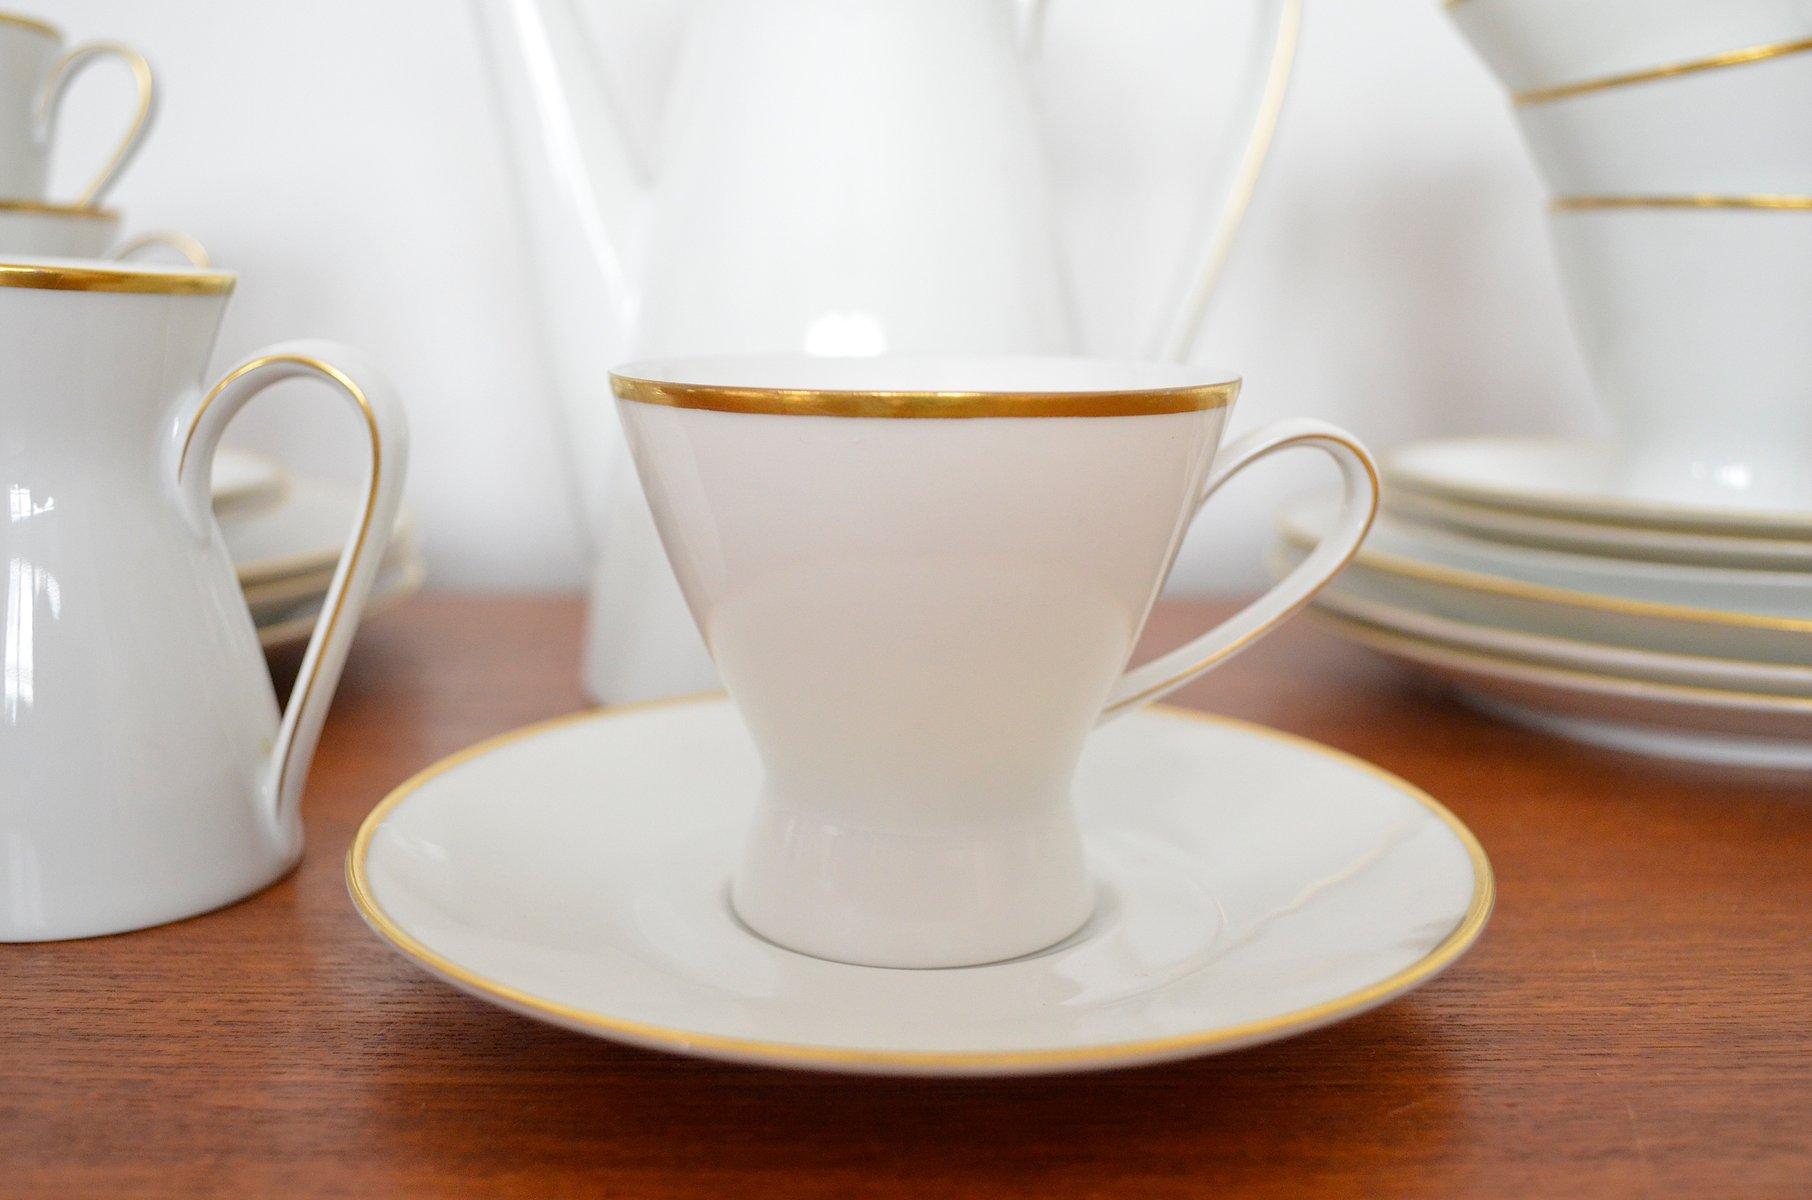 kaffeeservice f r sechs personen von raymond loewy richard latham f r rosenthal 1950s bei. Black Bedroom Furniture Sets. Home Design Ideas